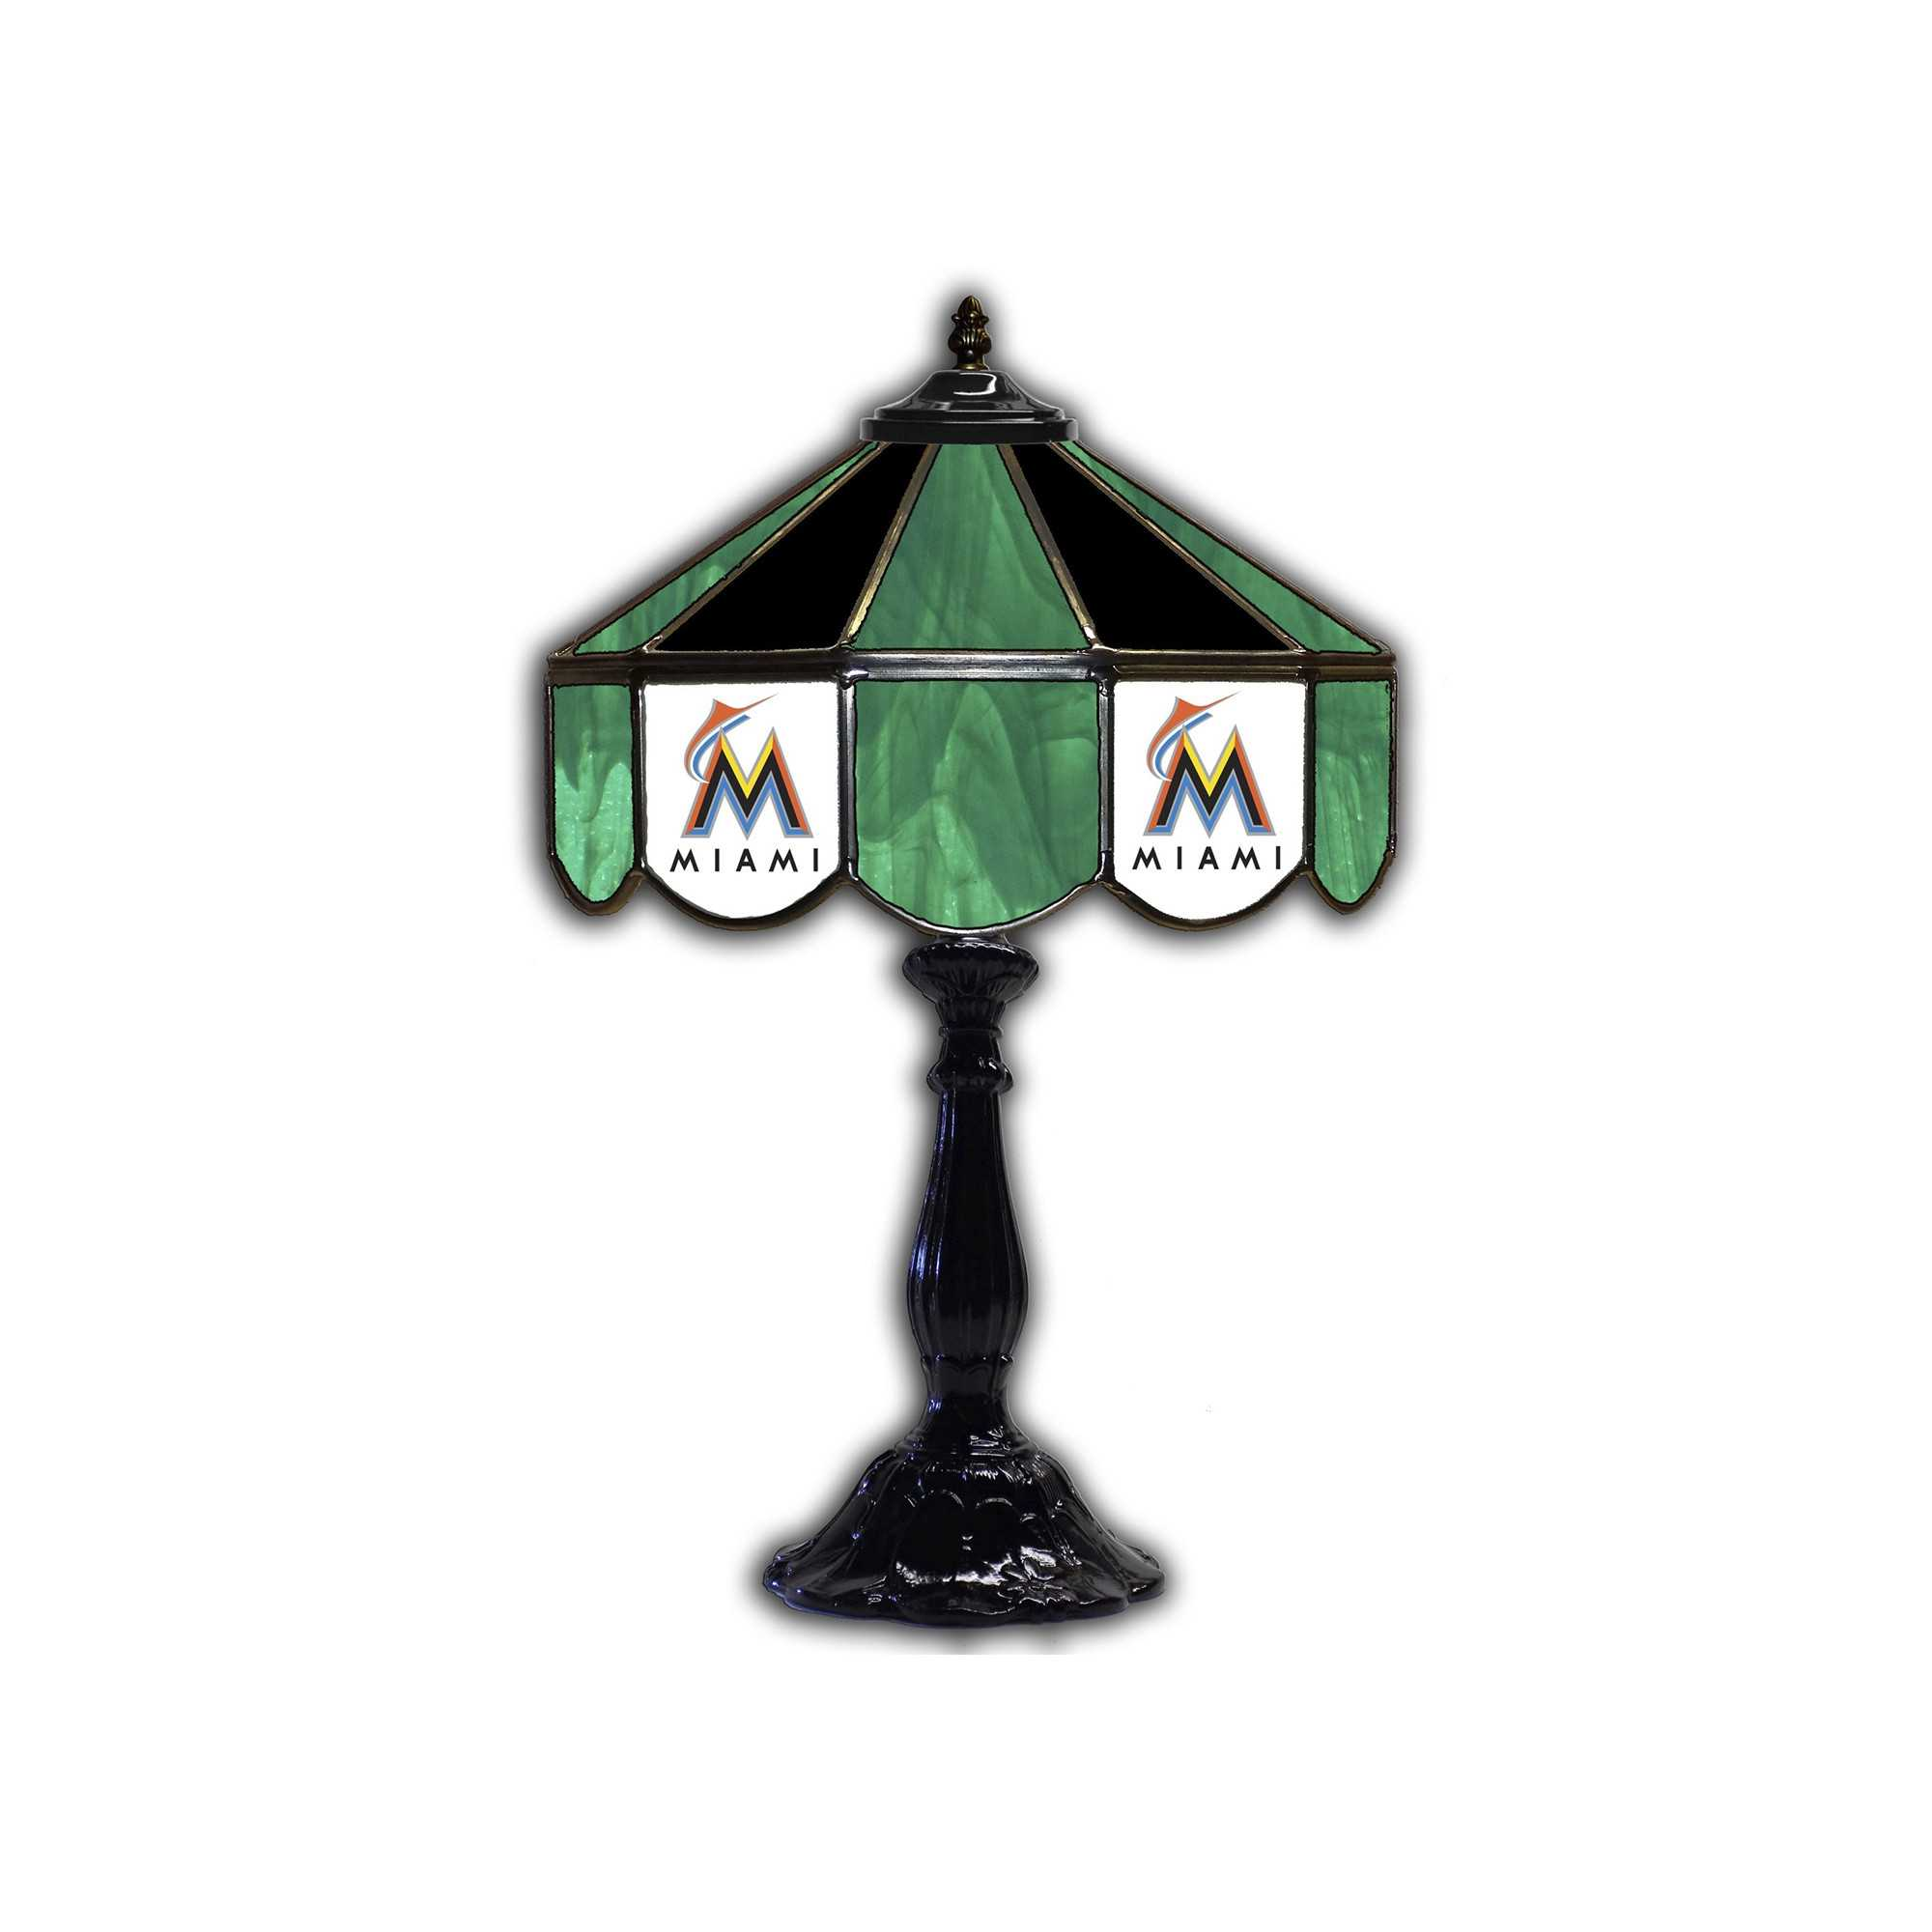 "MIAMI MARLINS 21""GLASS LAMP"